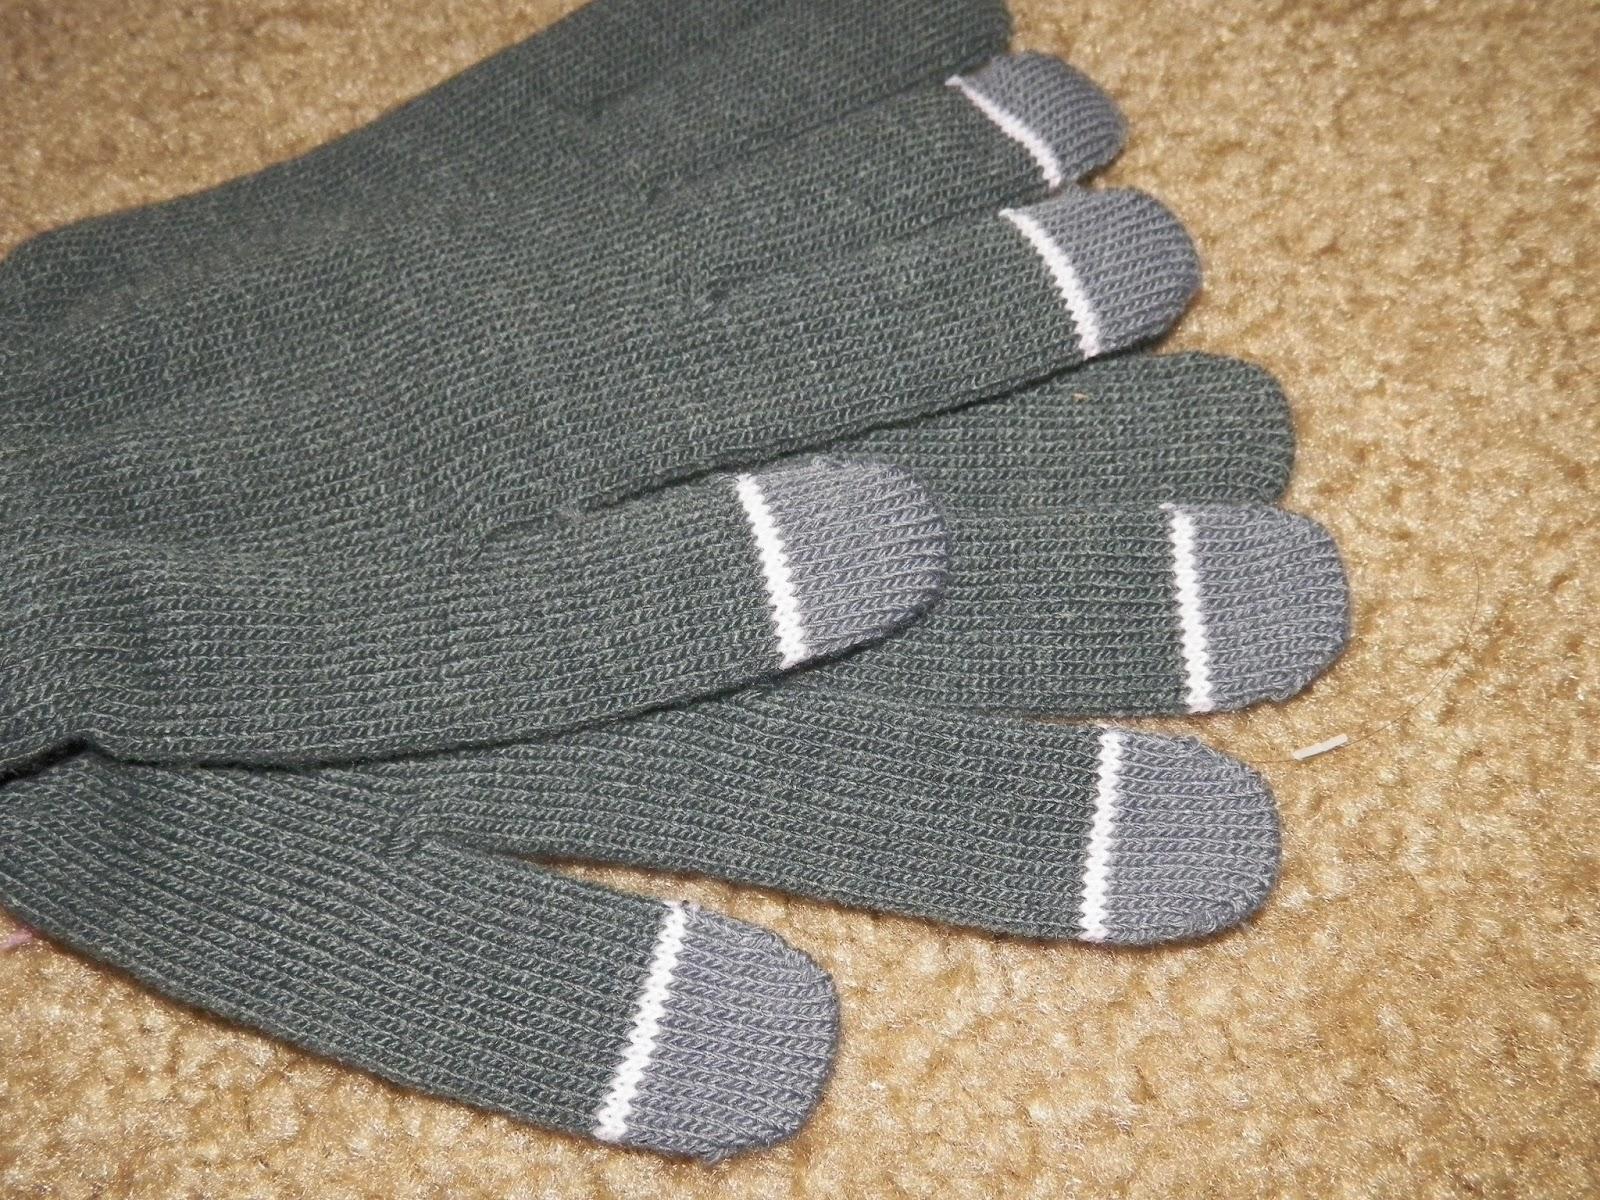 iGotTech_Texting_Gloves.jpg